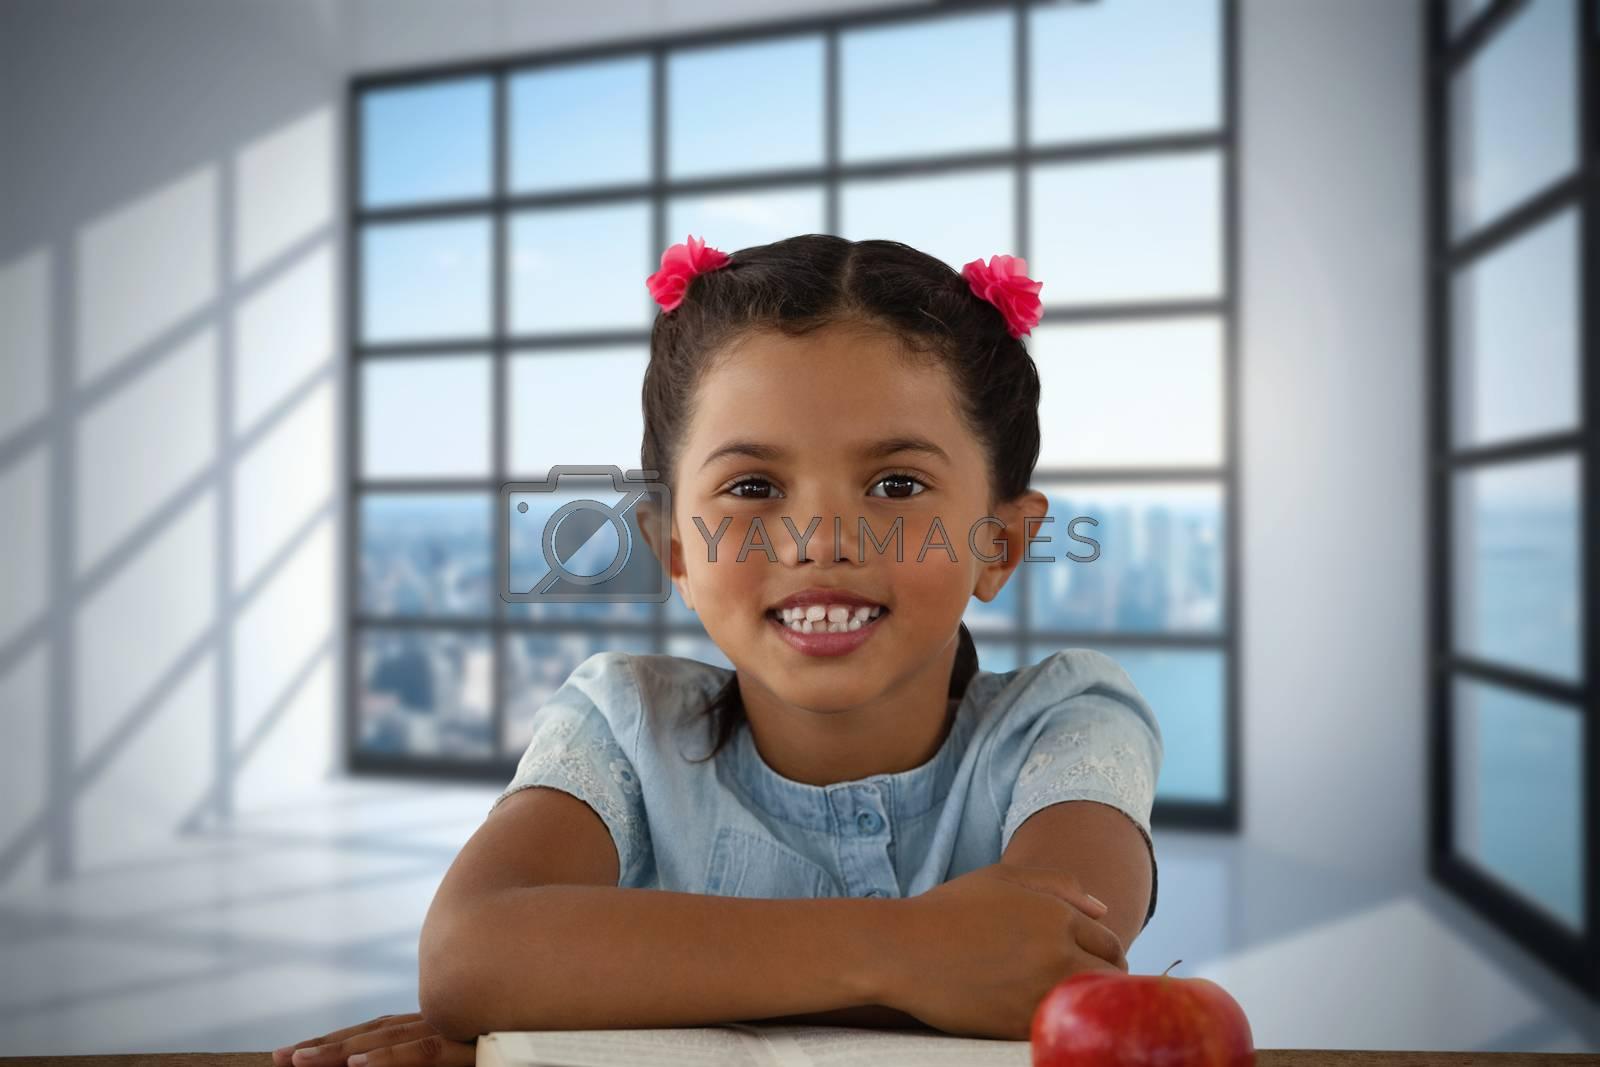 Composite image of smiling girl sitting at desk by Wavebreakmedia